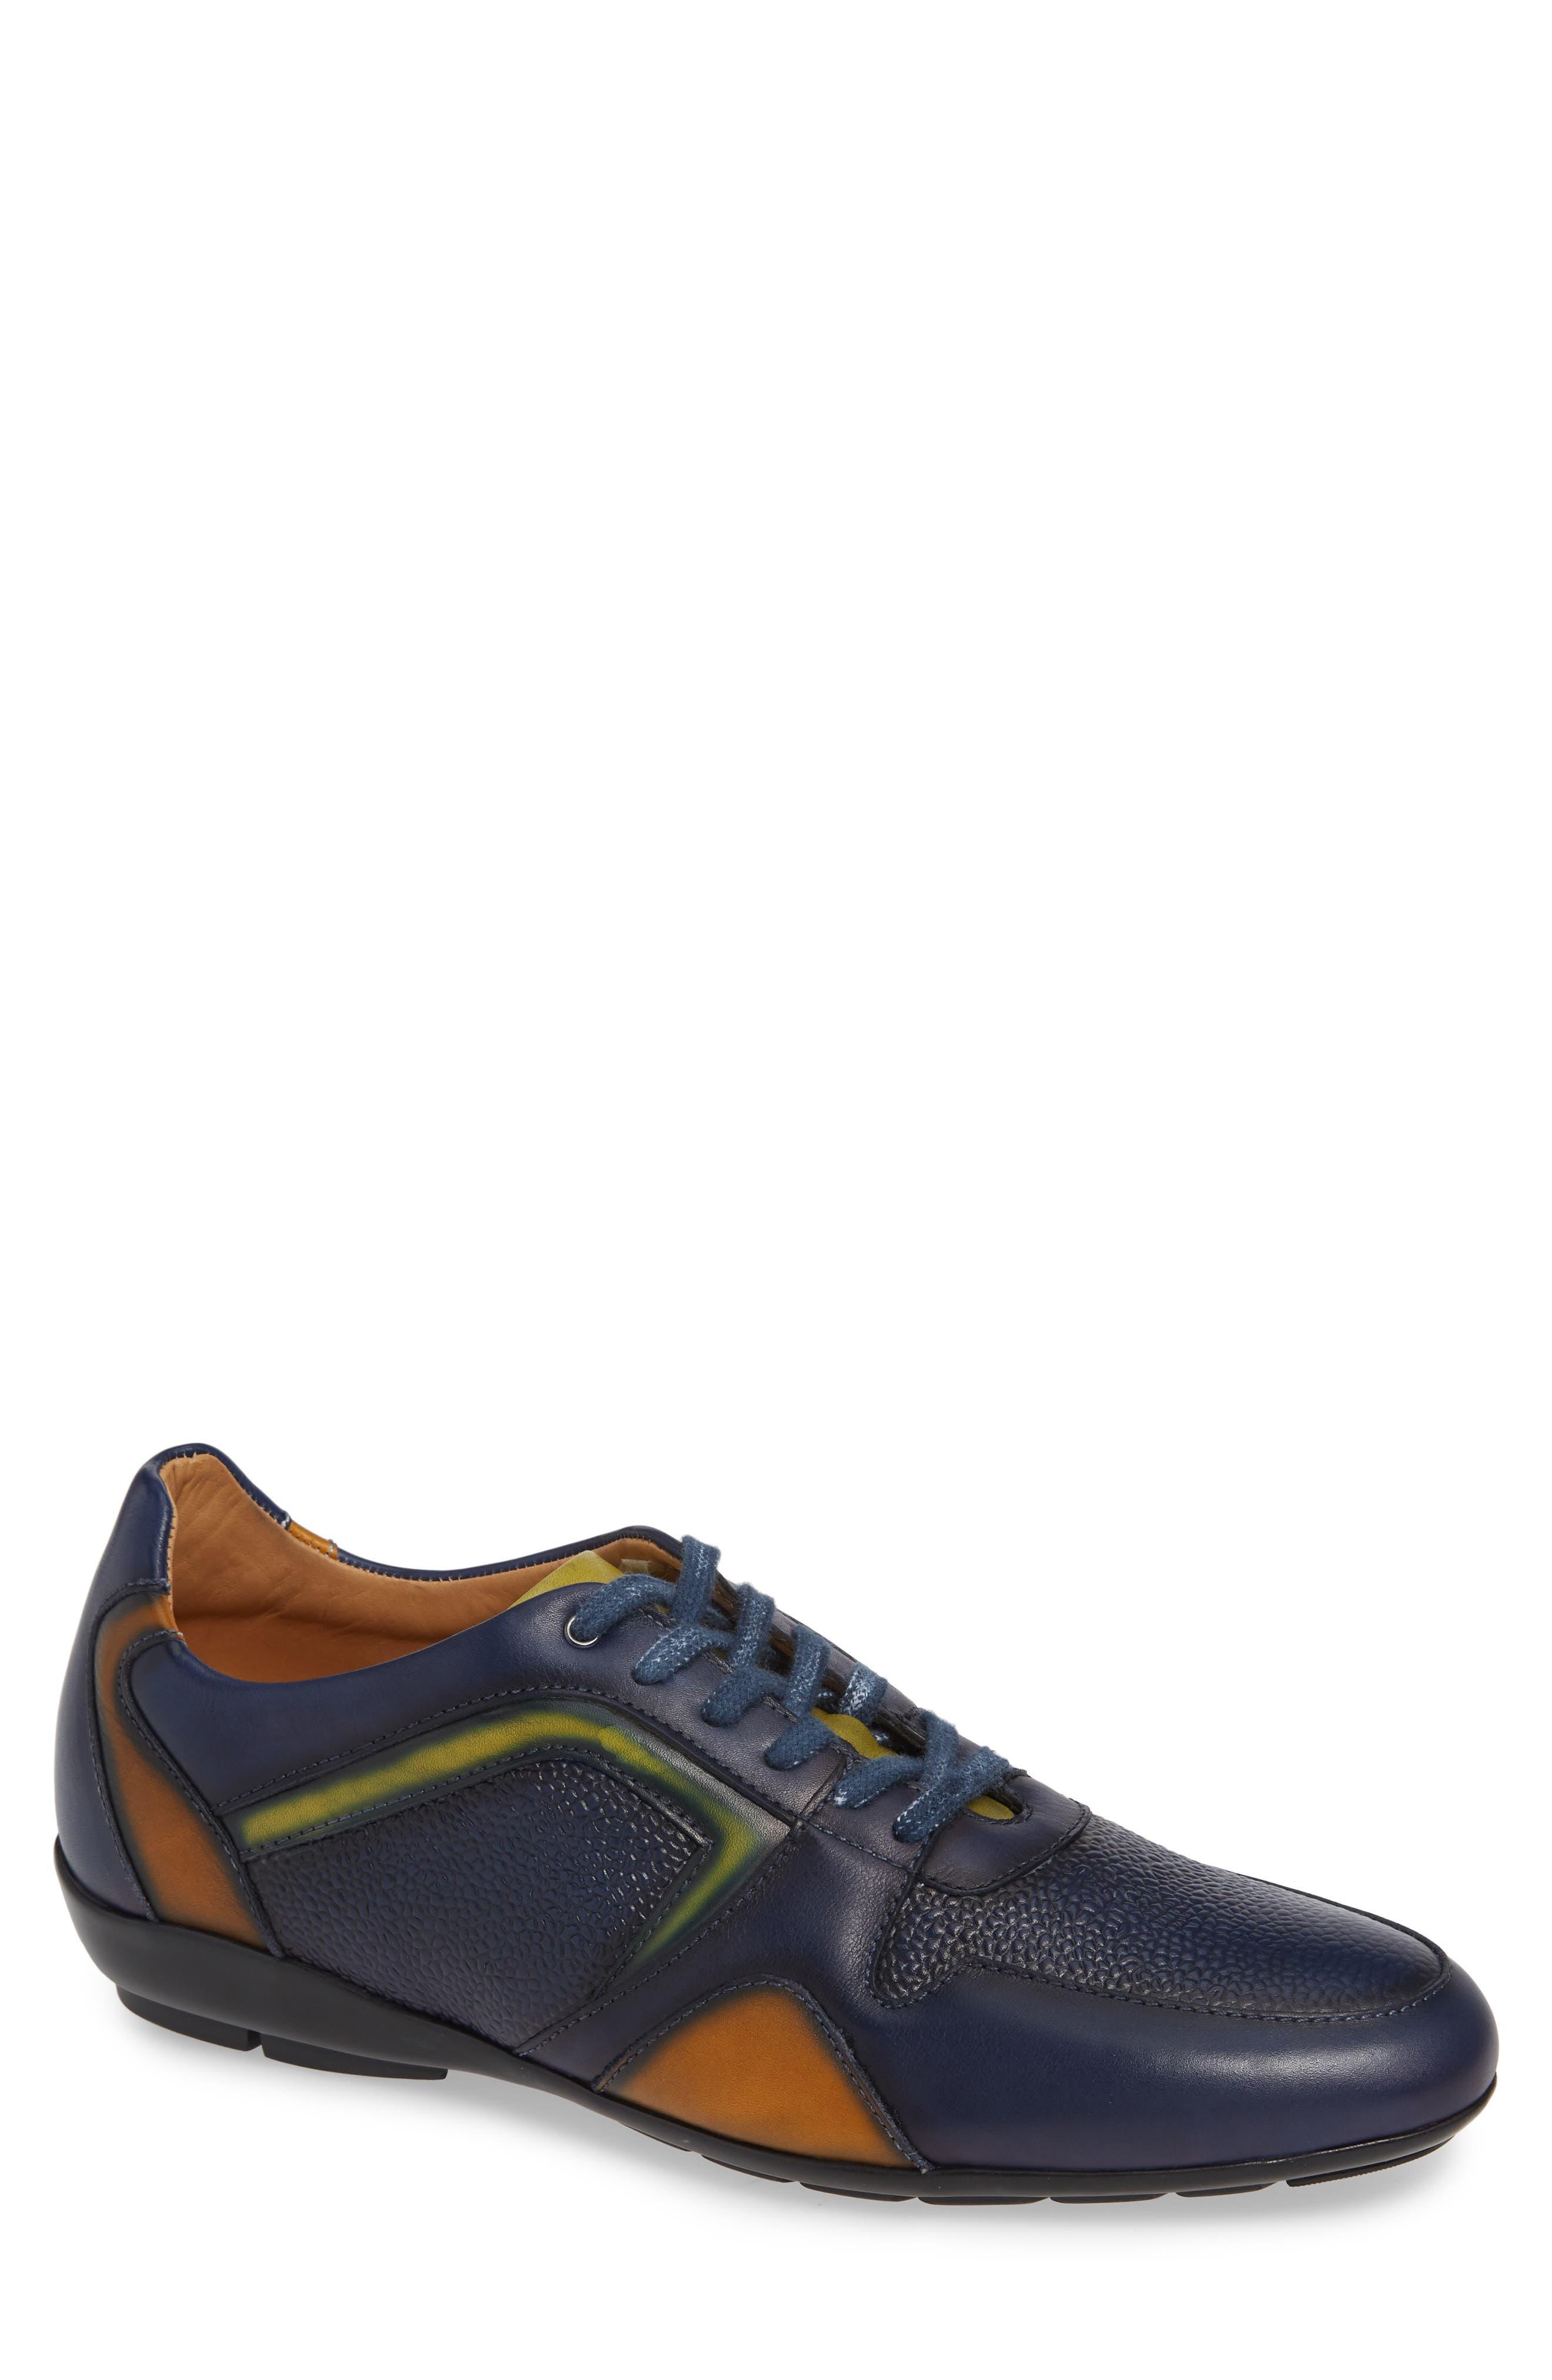 Mezlan Campo Sneaker, Blue